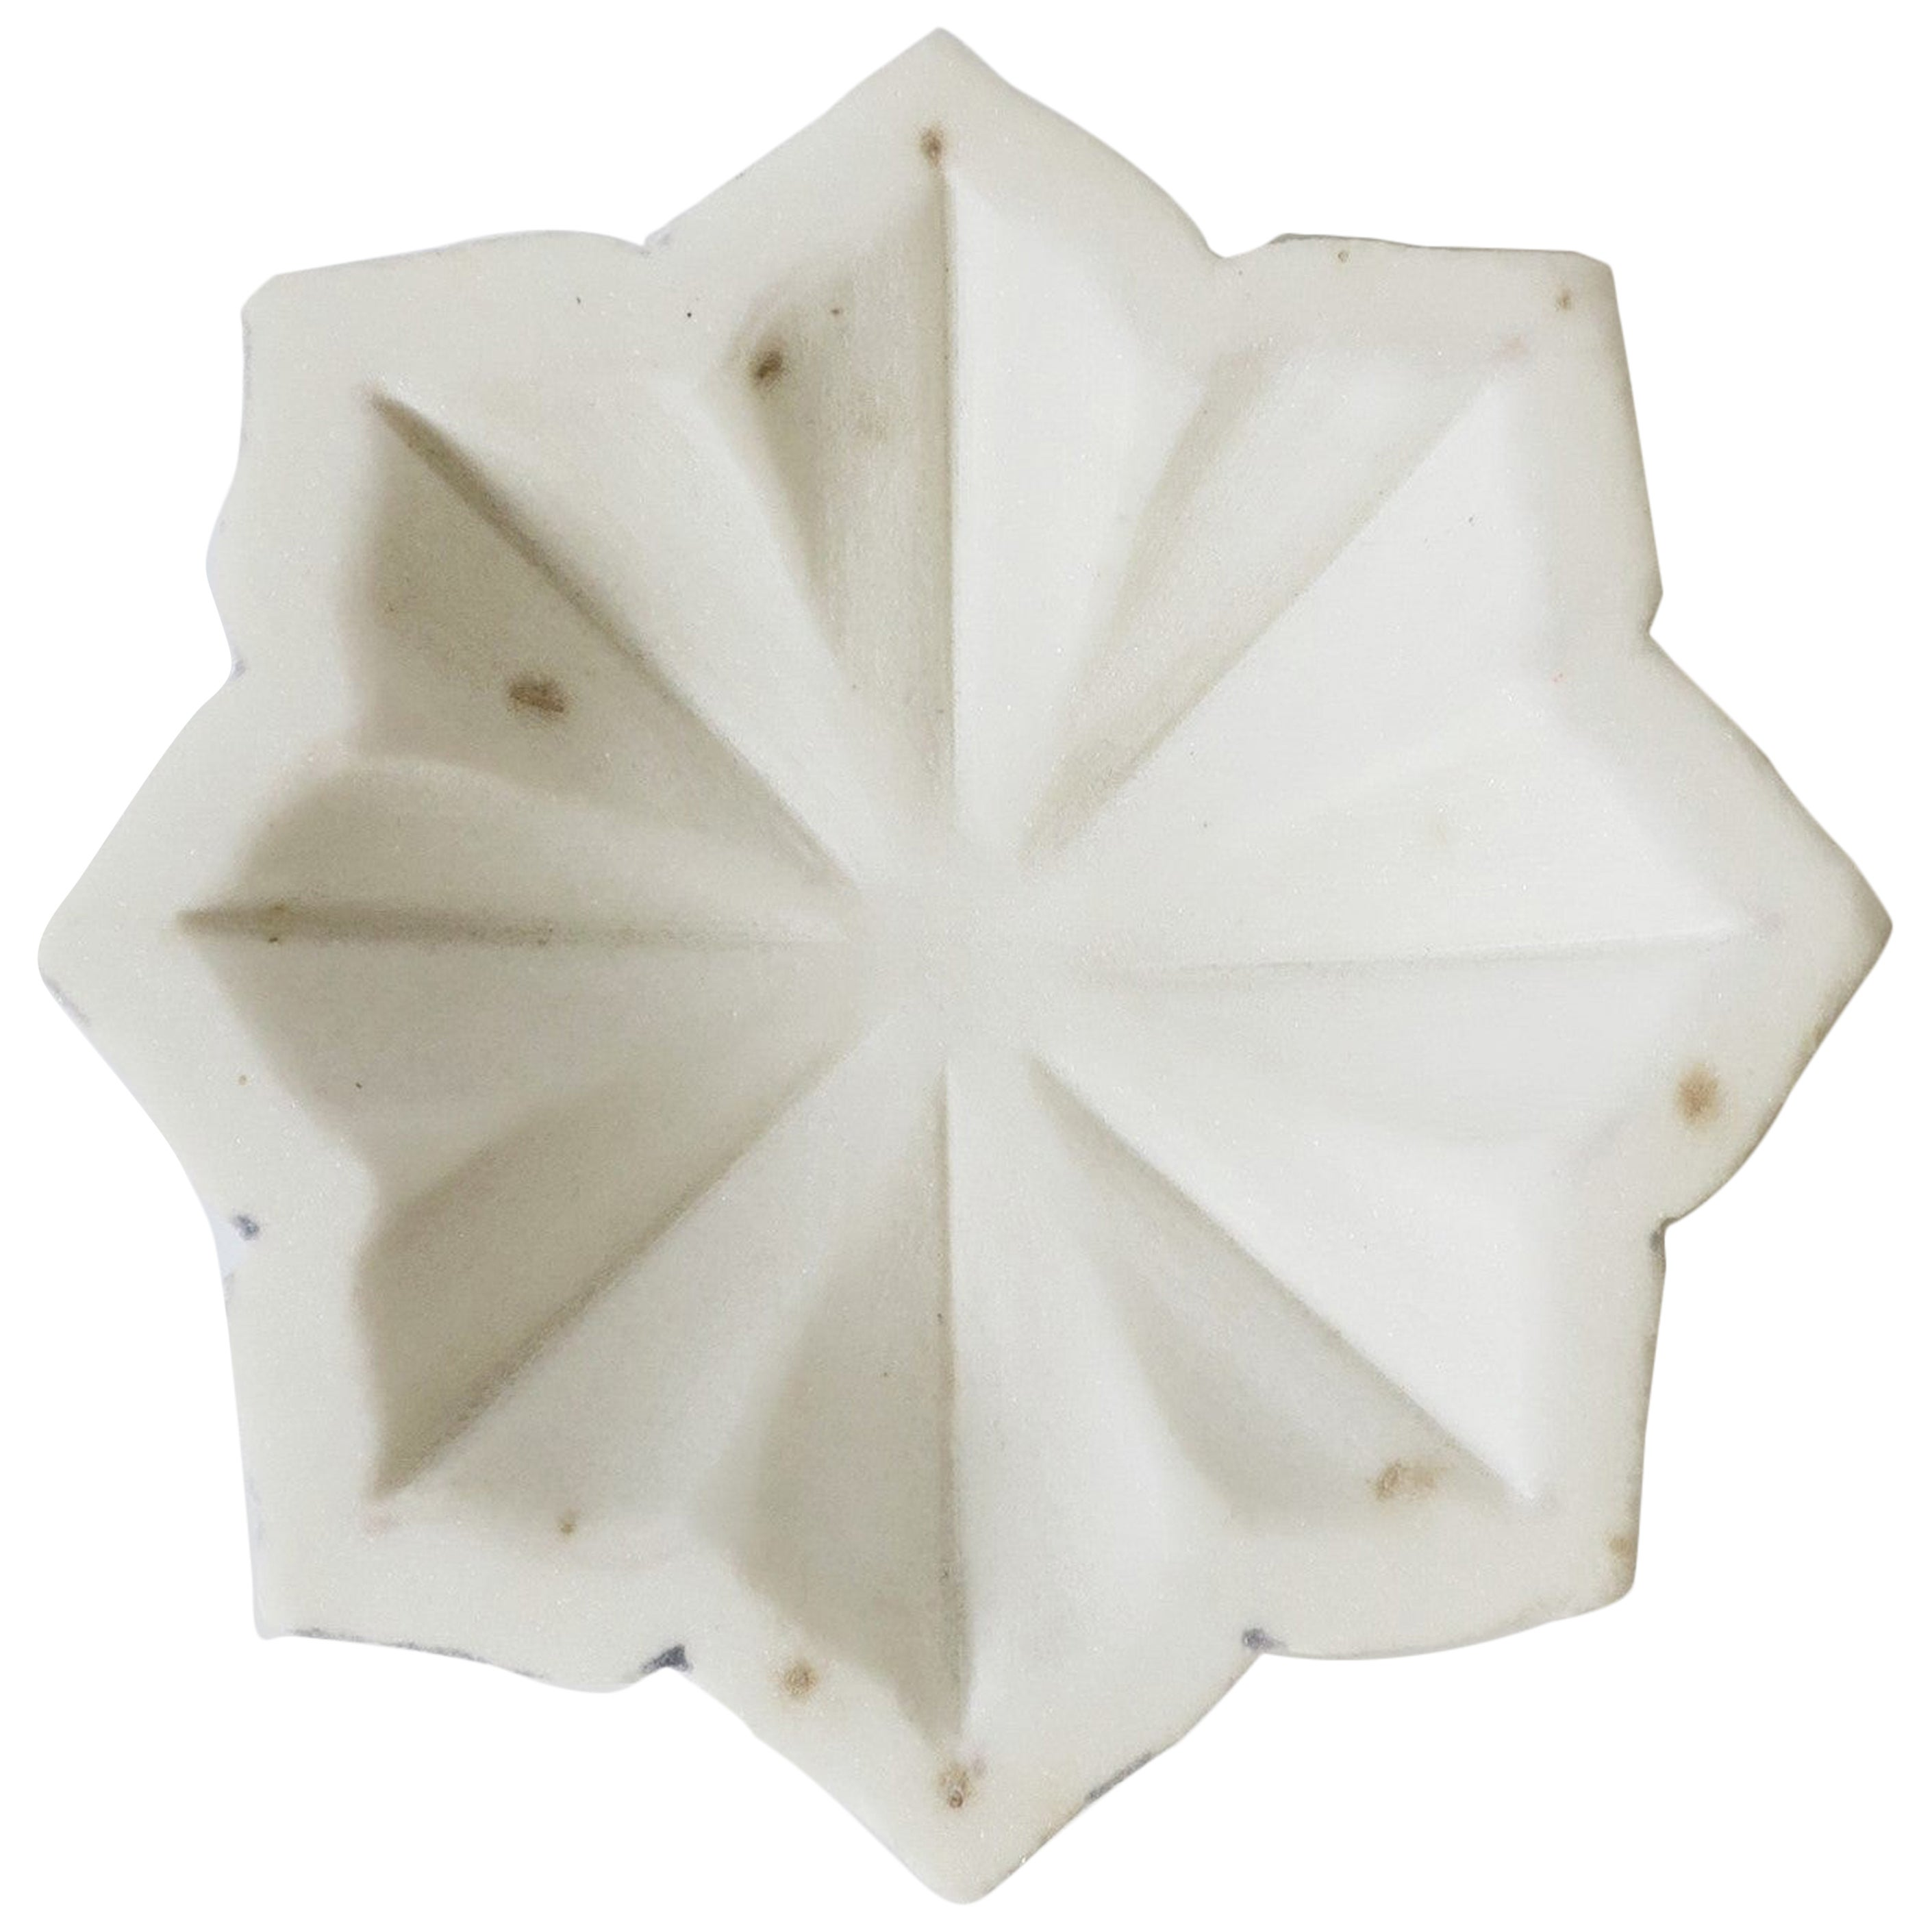 White Marble Dish or Vide-Poche